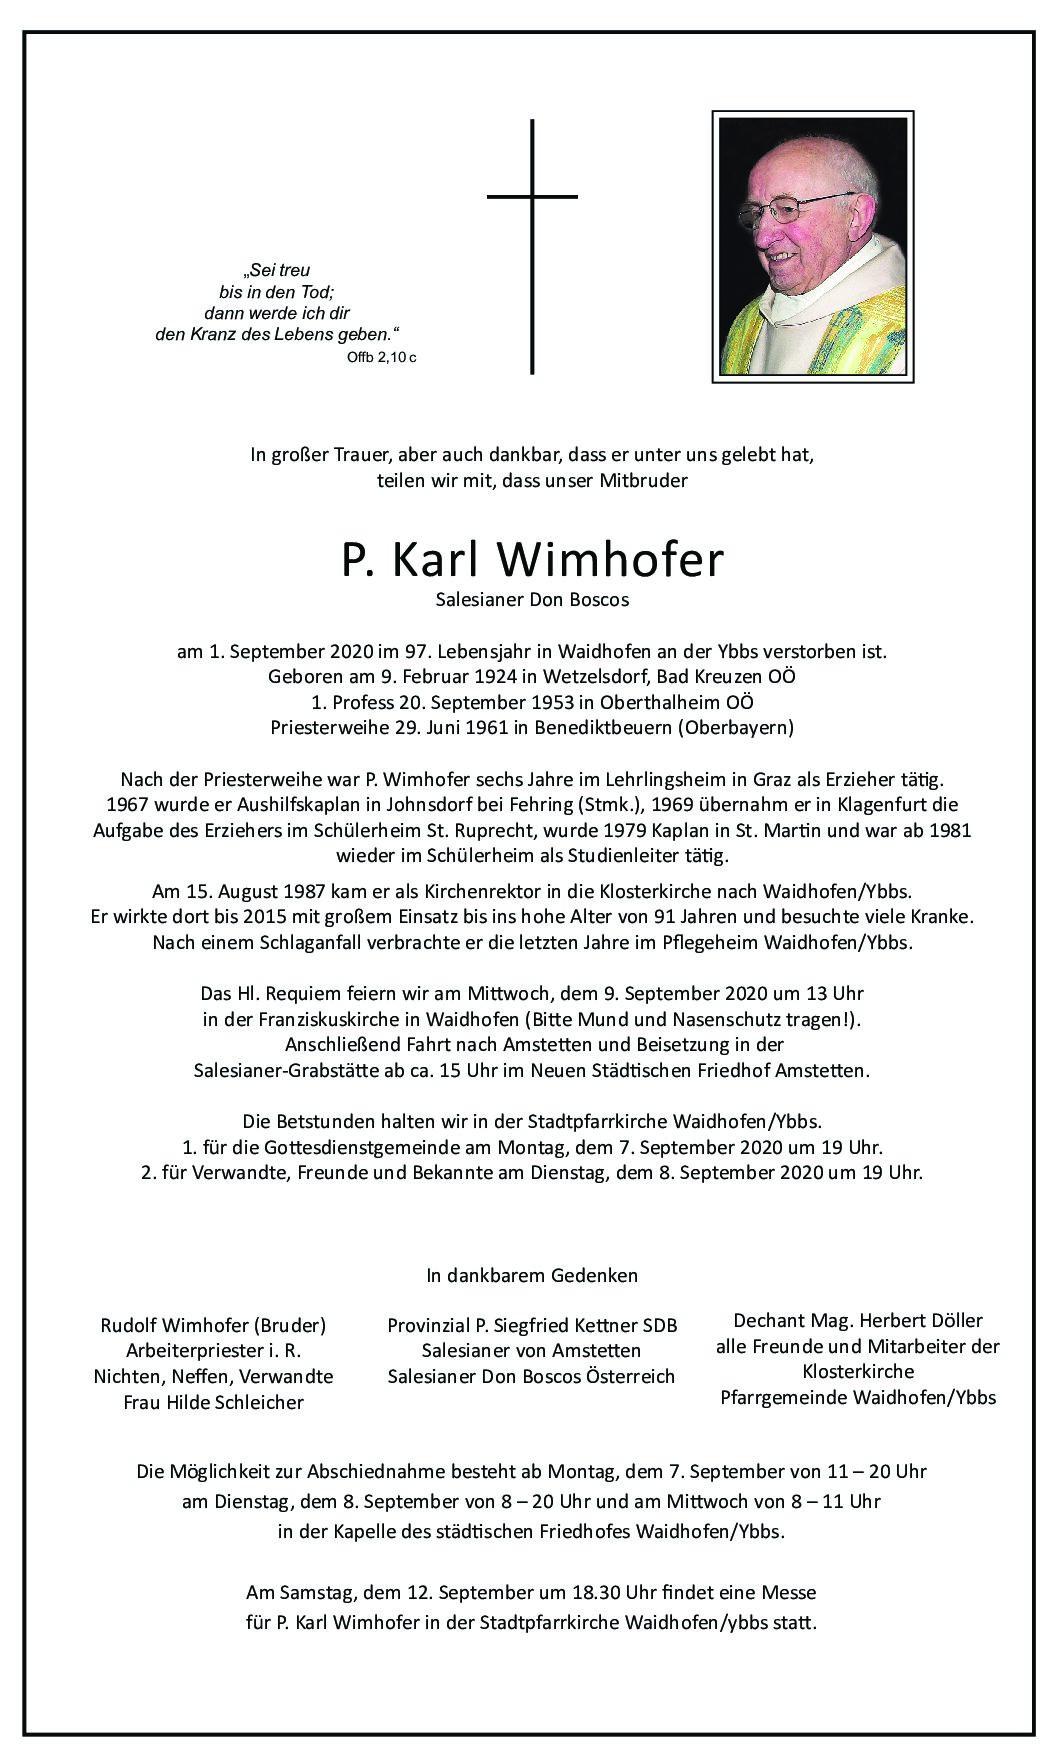 P. Karl Wimhofer